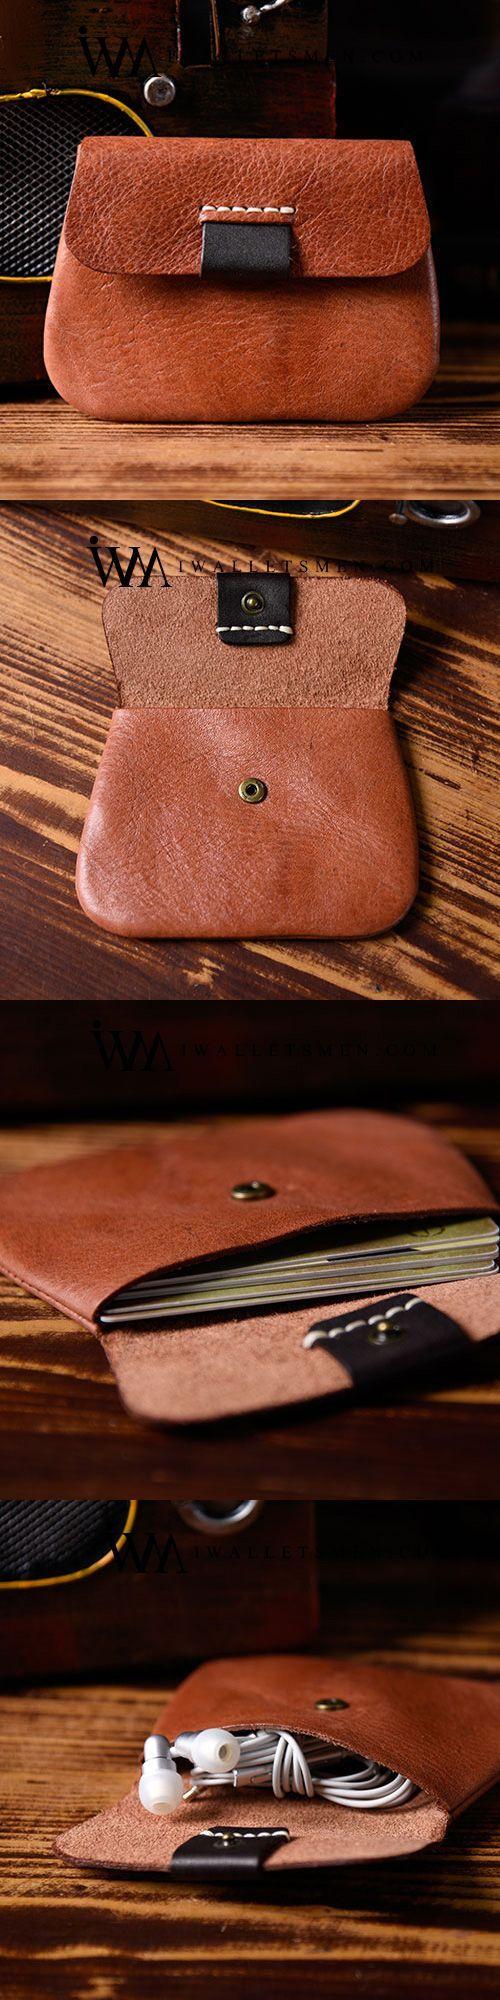 Handmade Mens Cool Short Leather Wallet Men Small Coin Slim Wallets Bifold for Men